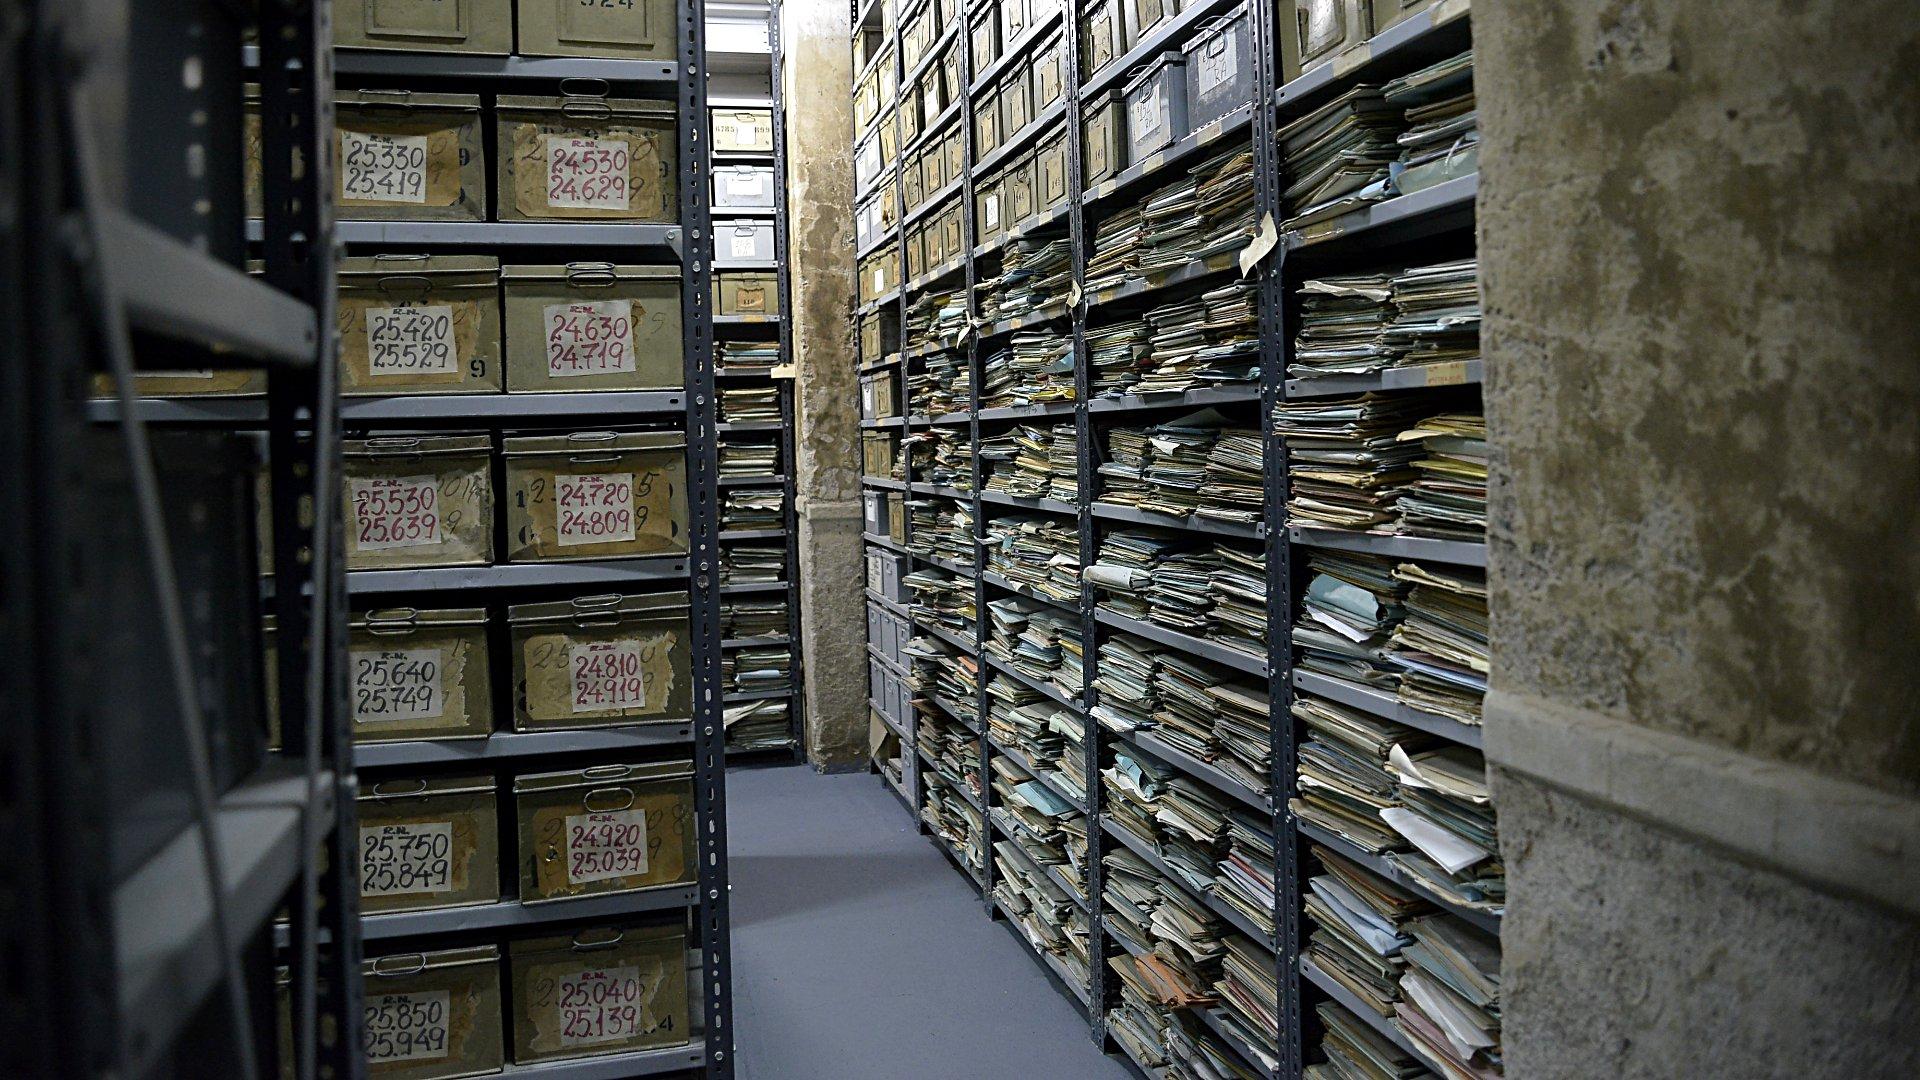 Estanteías antiguas con cientos de miles de papeles